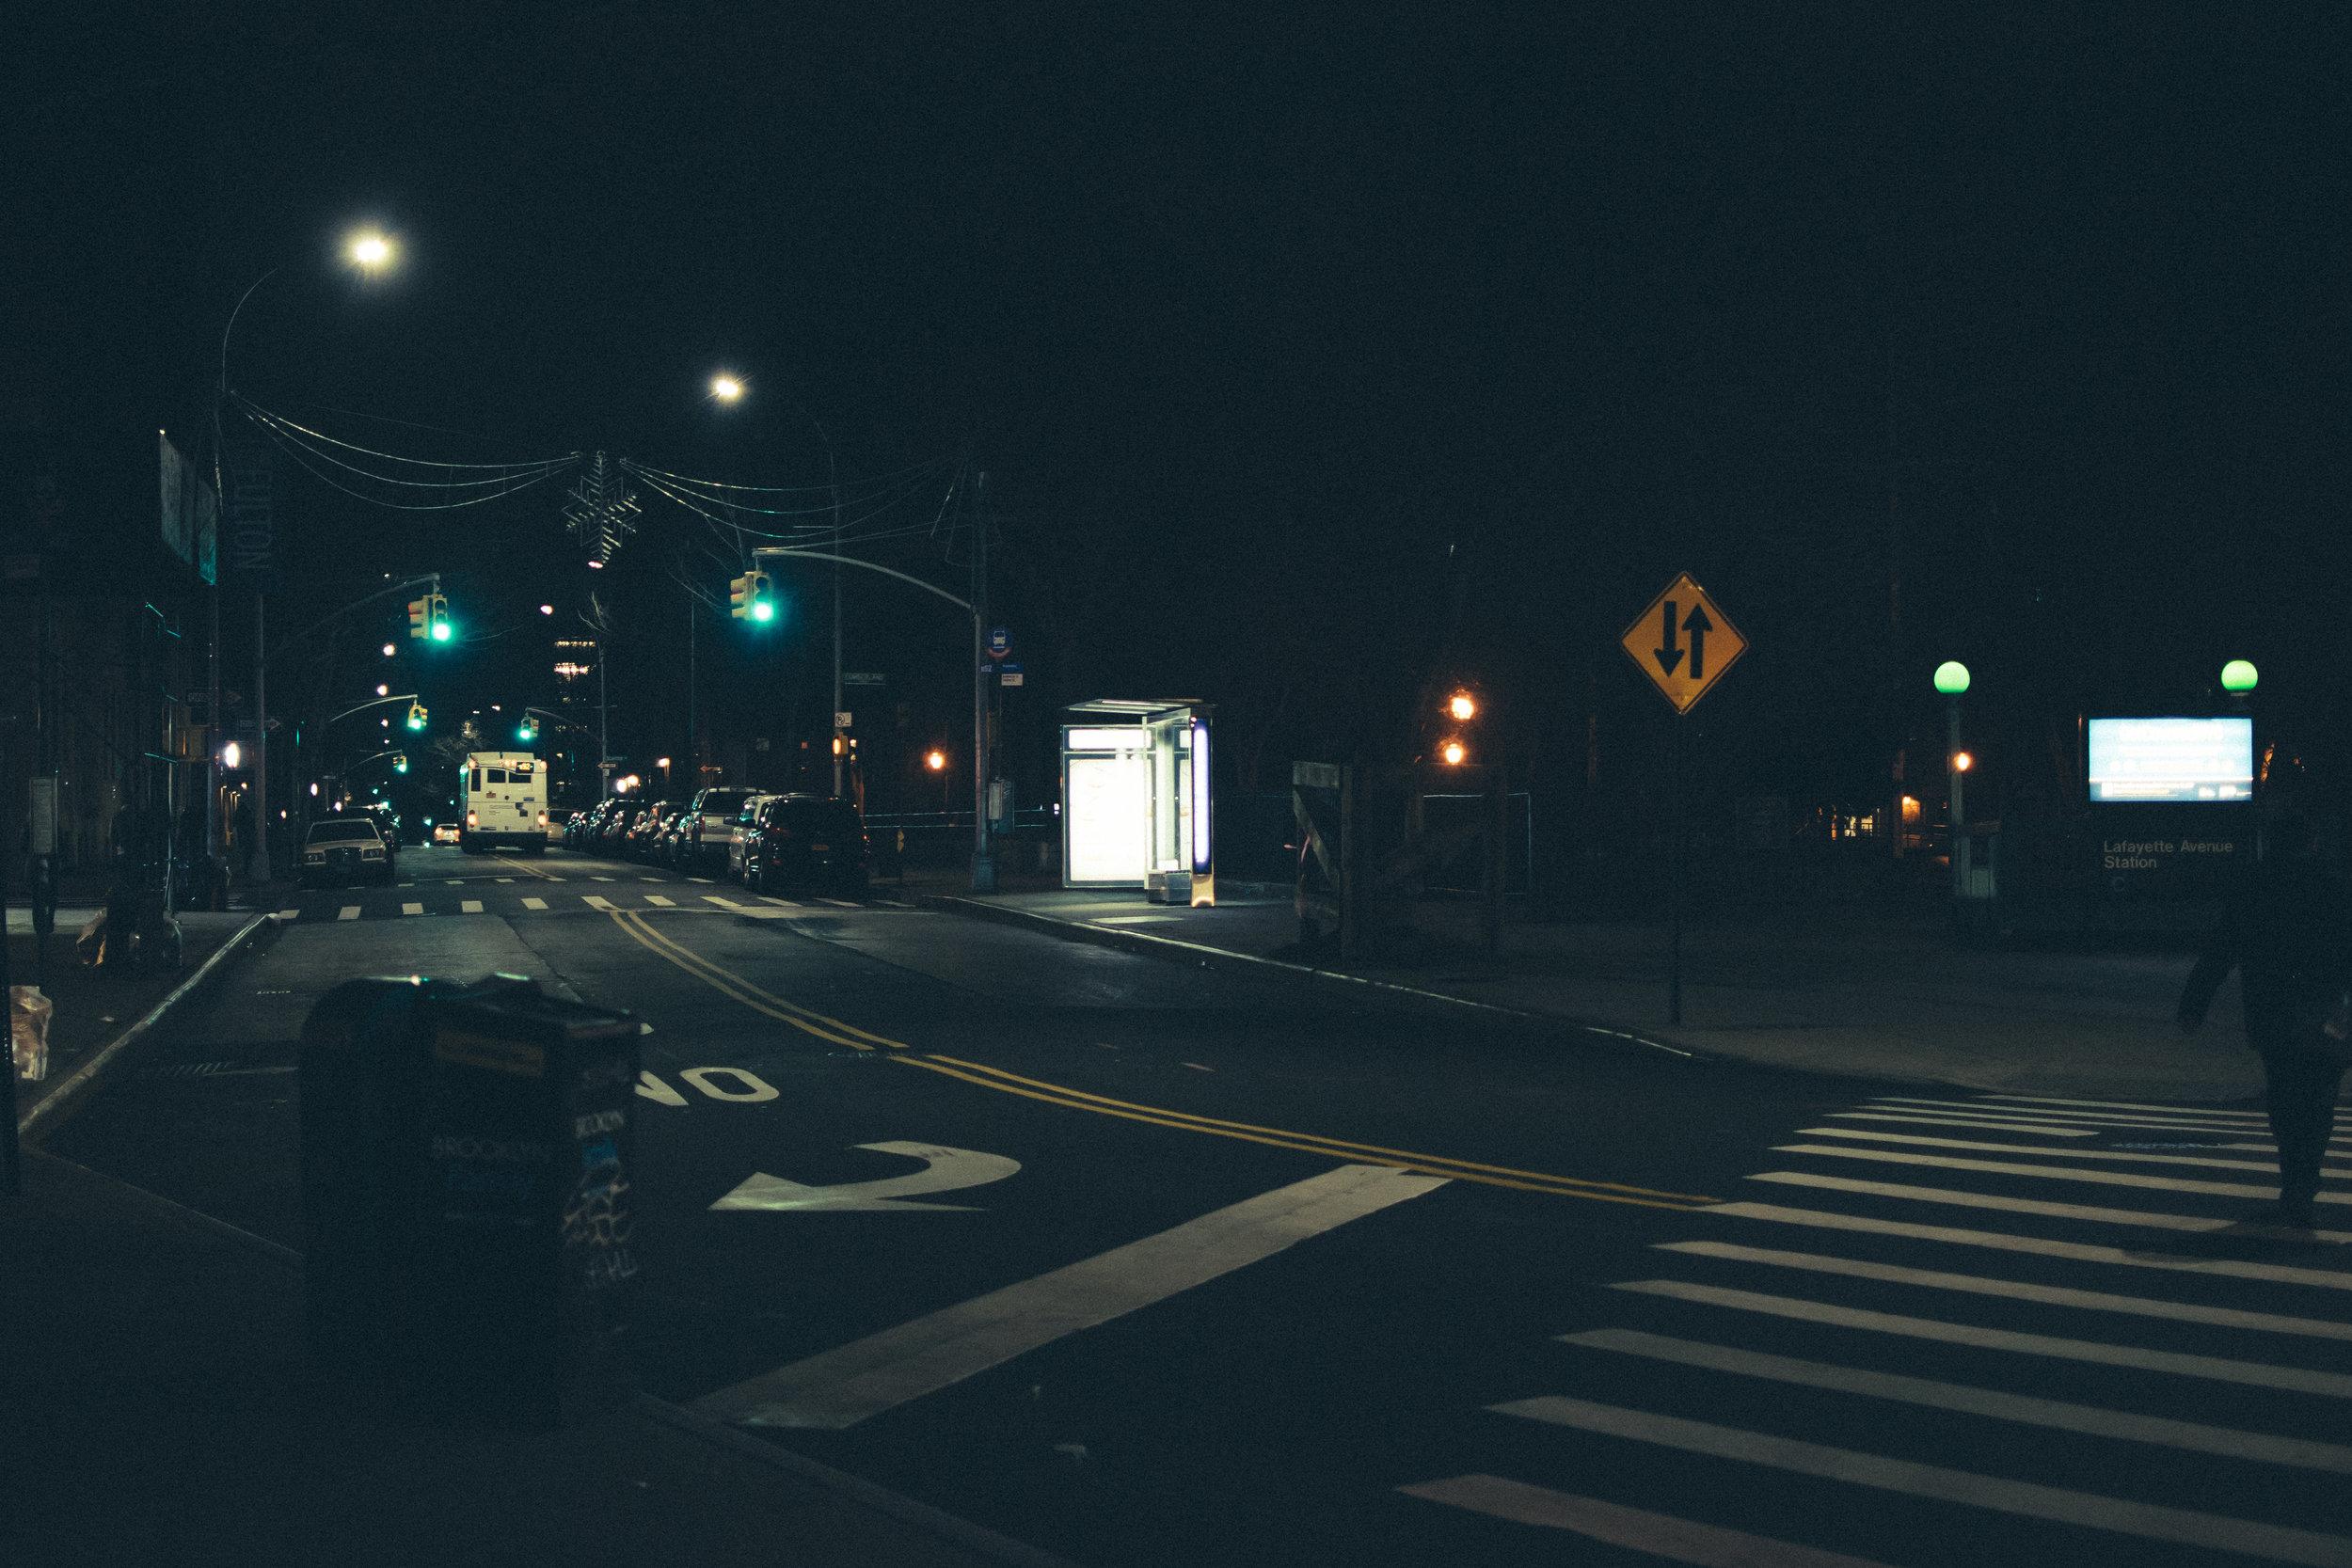 Kyle Studstill_Composure_New York City-8-2.jpg